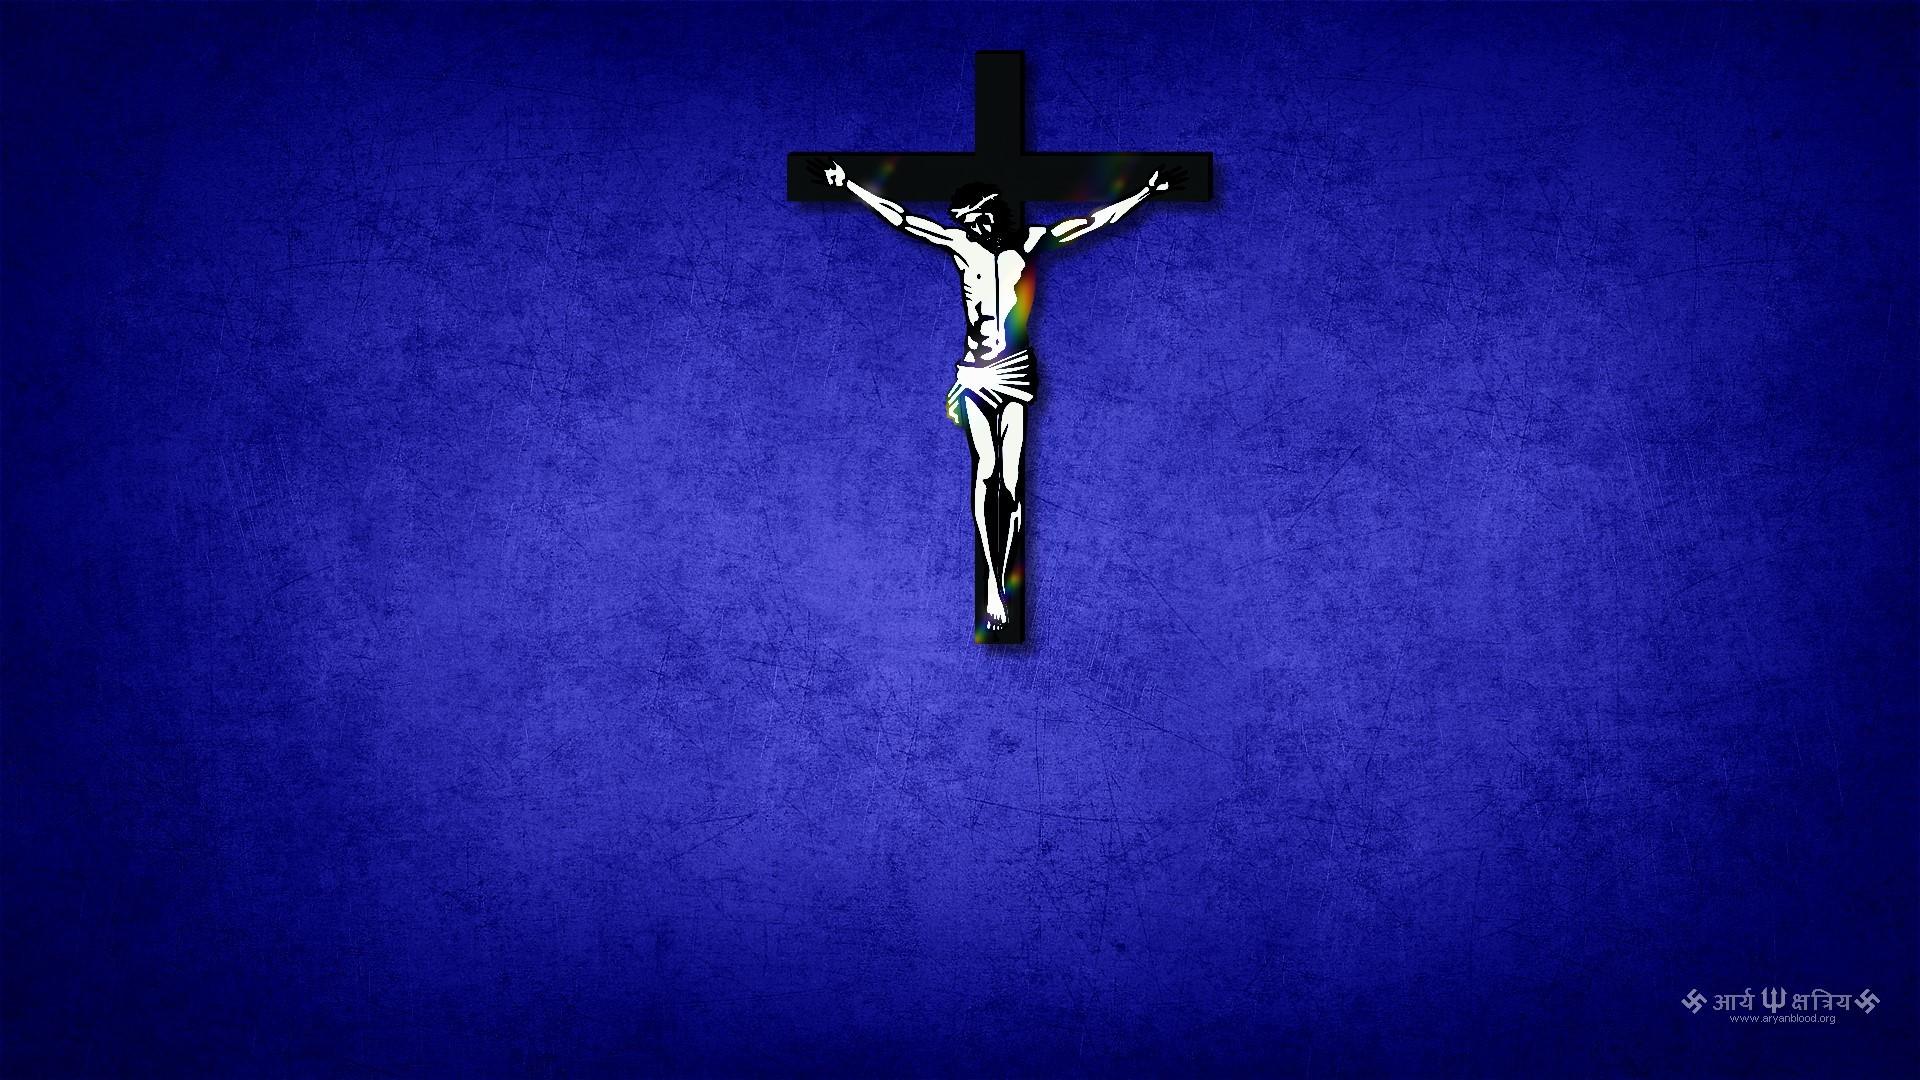 fav 0 rate 0 tweet 1920x1080 religion jesus christianity cross 1920x1080